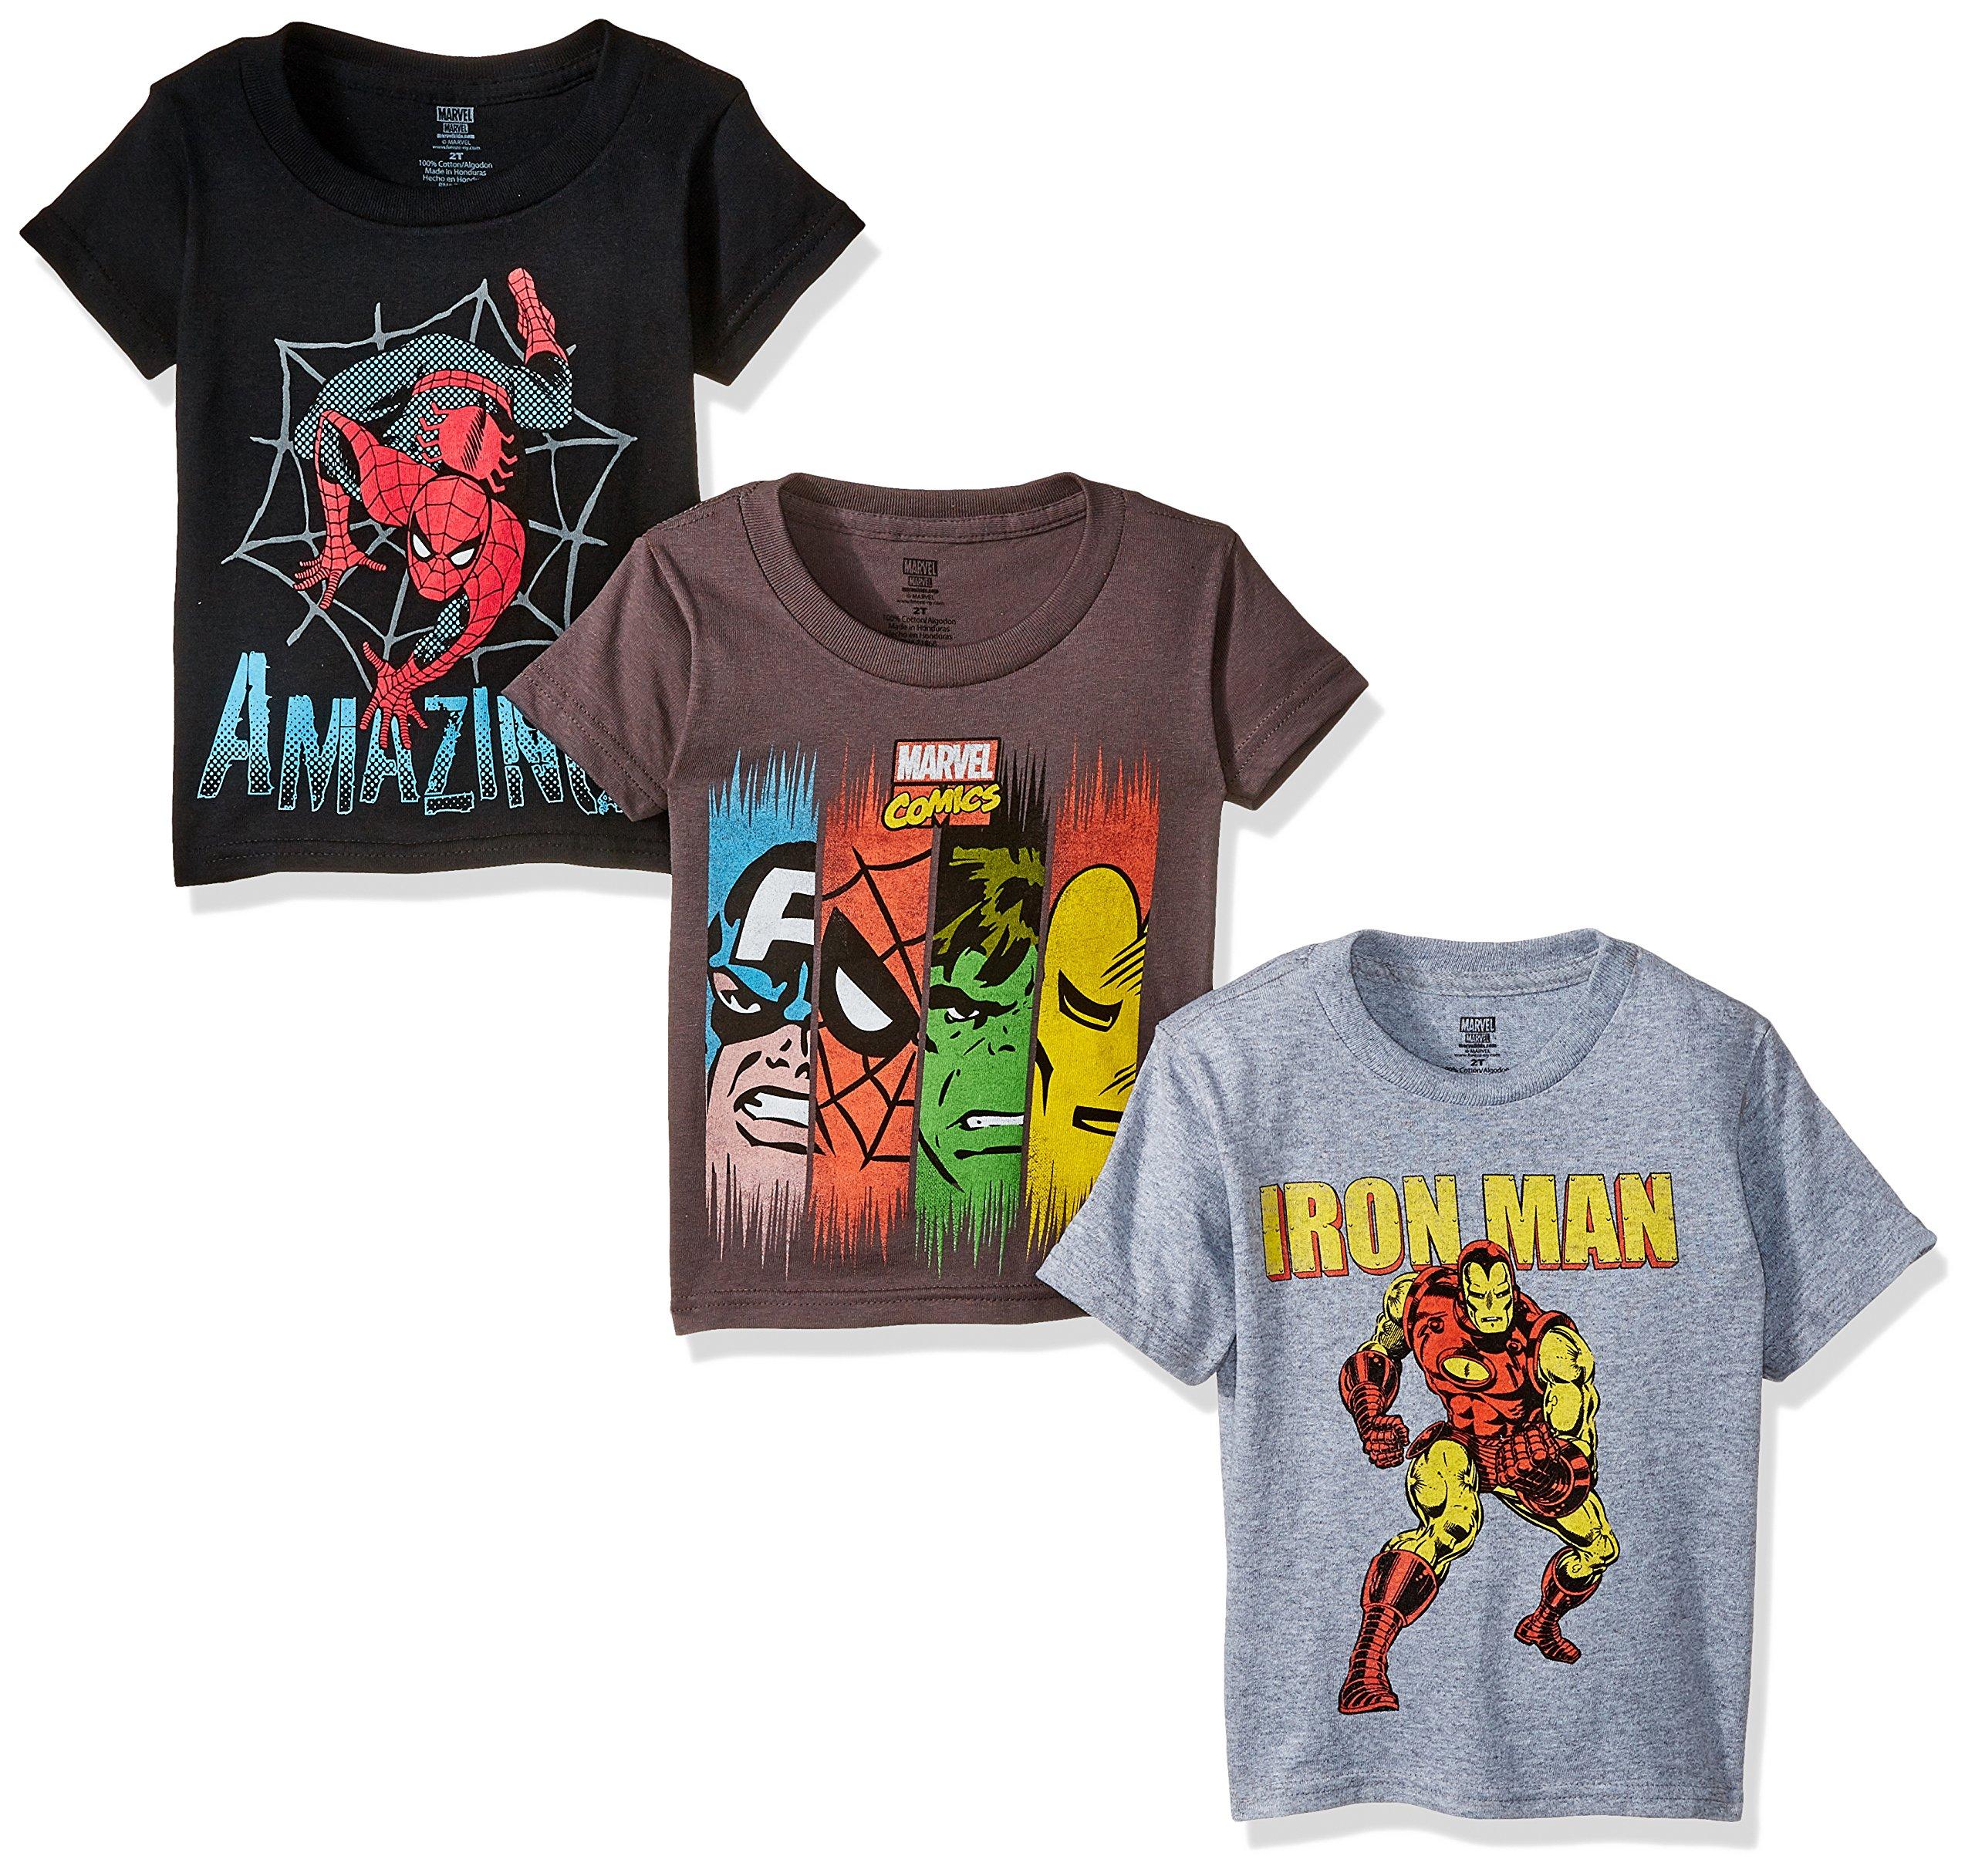 Marvel Boys' Toddler Boys' Super Heroes 3 Pack T-Shirt Bundle, Charcoal/Black/Heather Grey, 3T